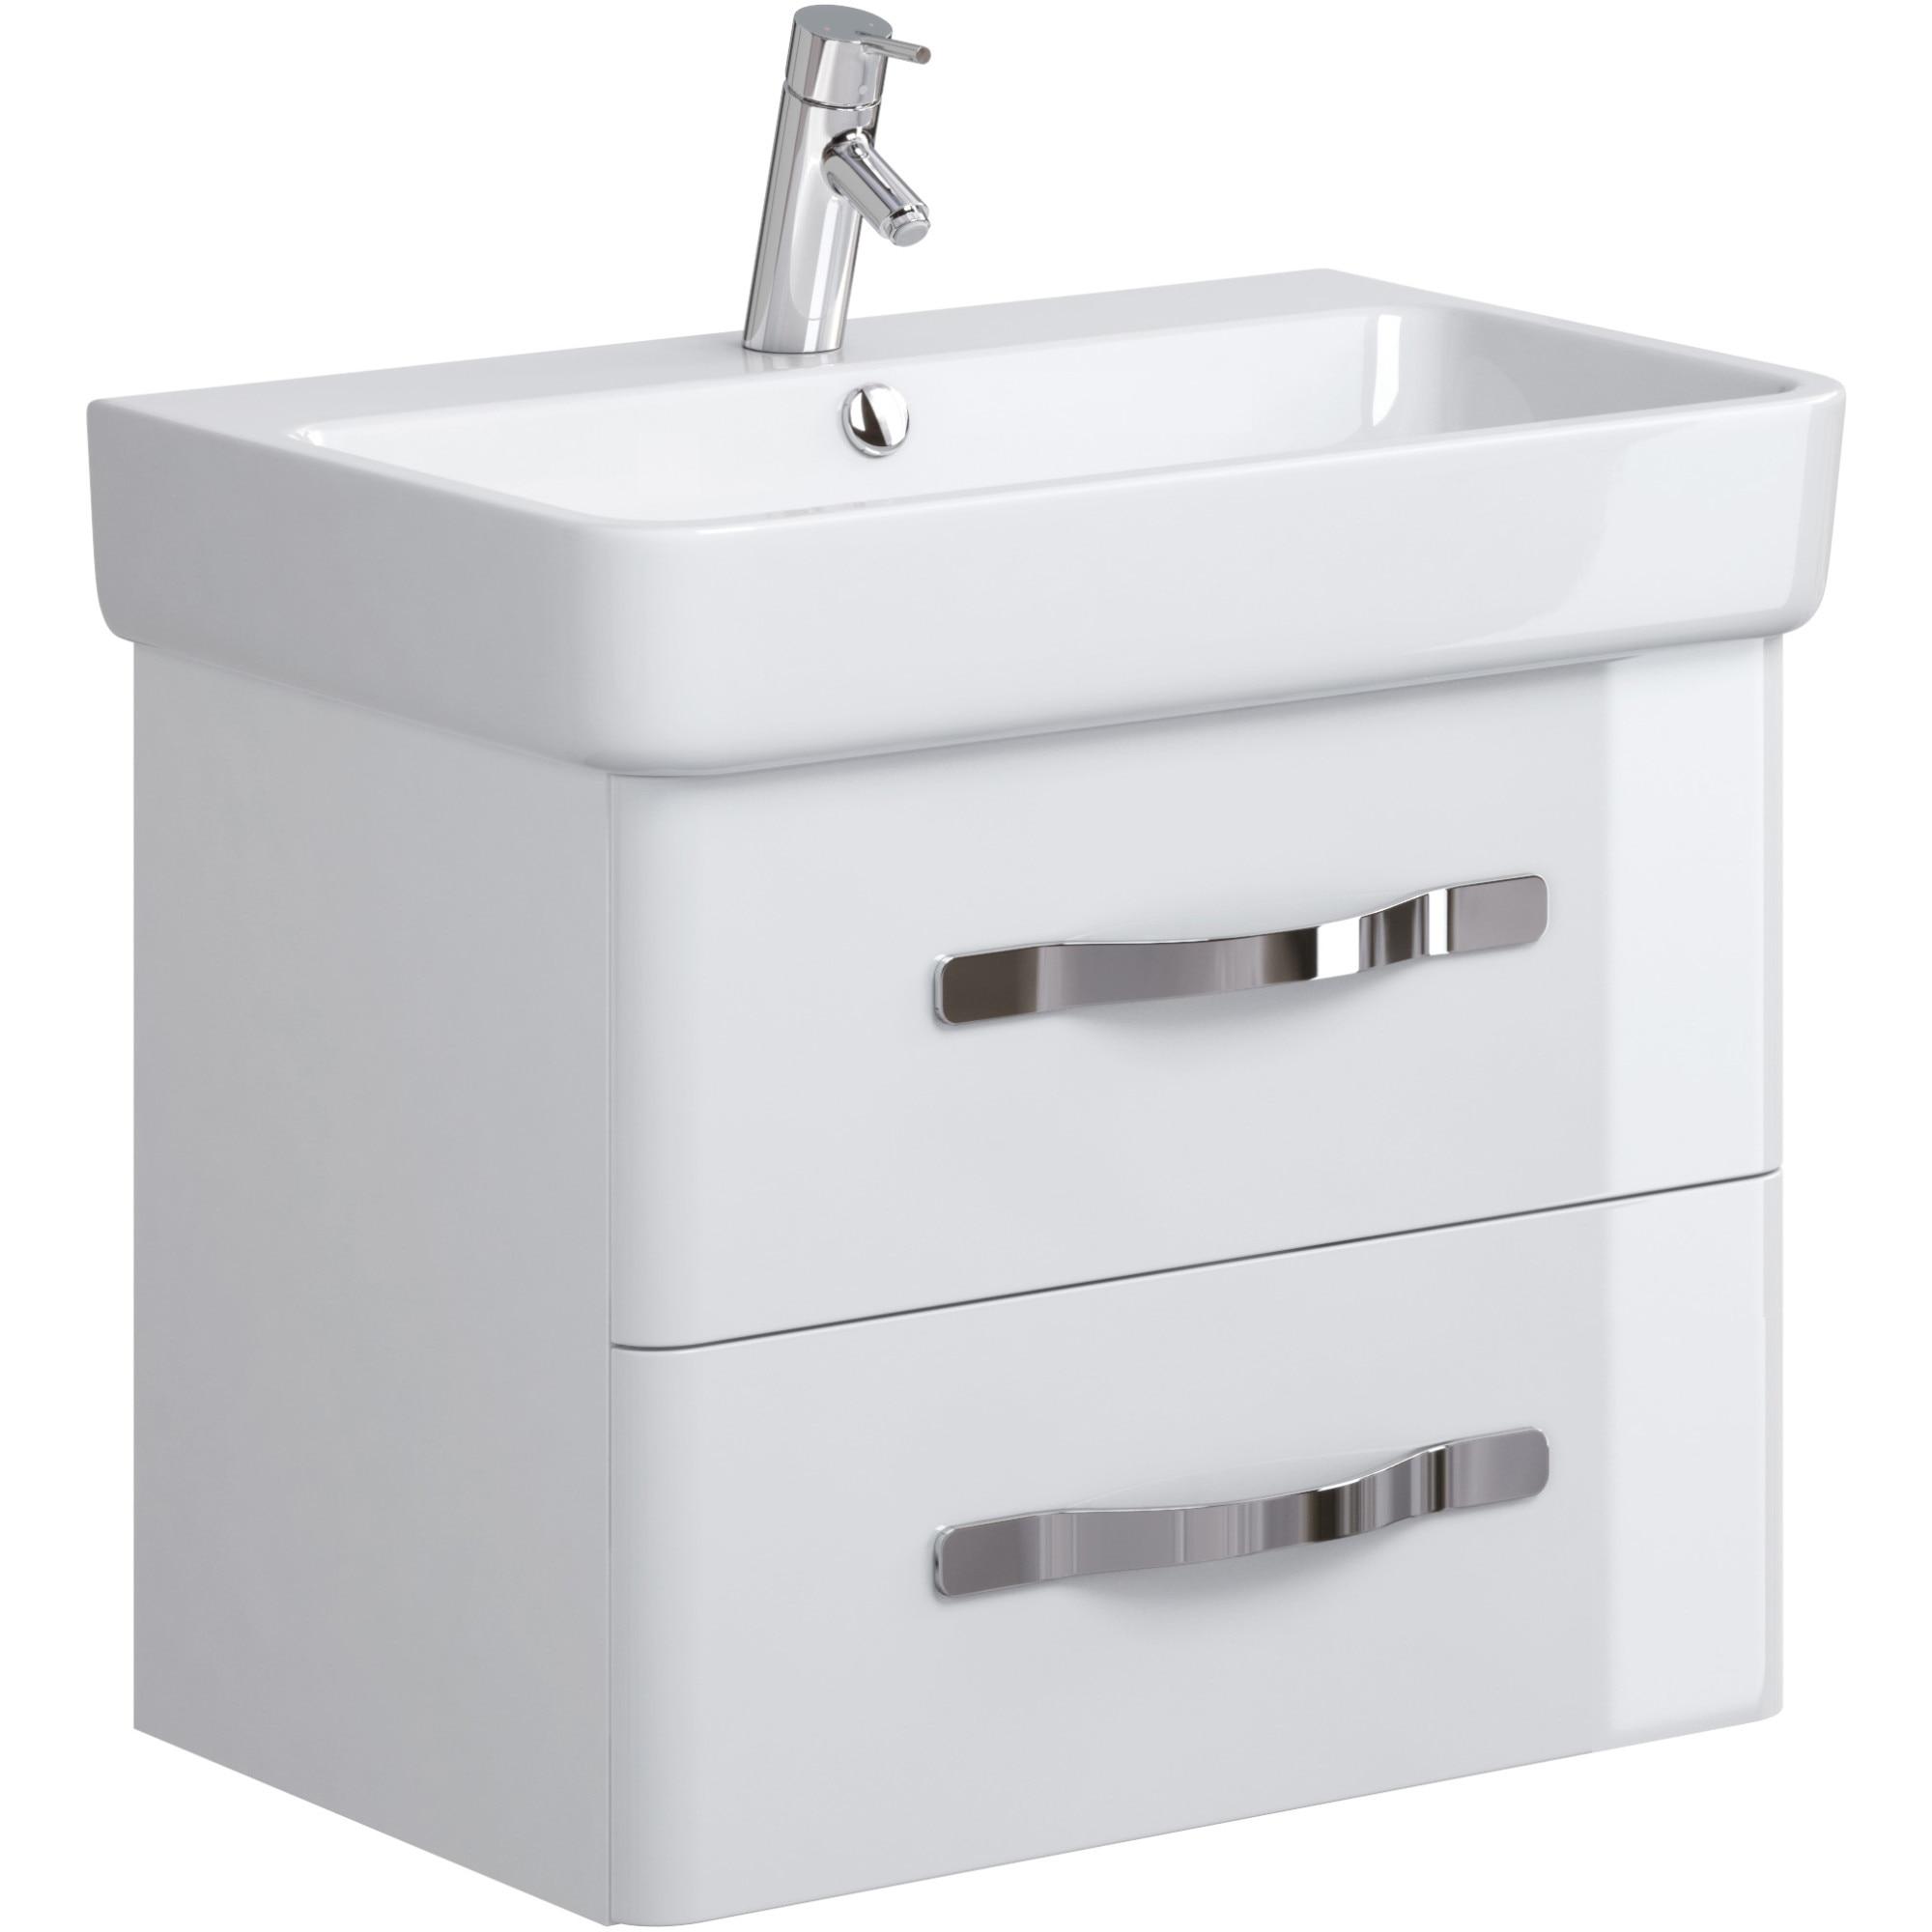 Fotografie Mobilier pentru lavoar Cersanit Urban Harmony OS580-002, 64.3x42x50 cm, alb, montat